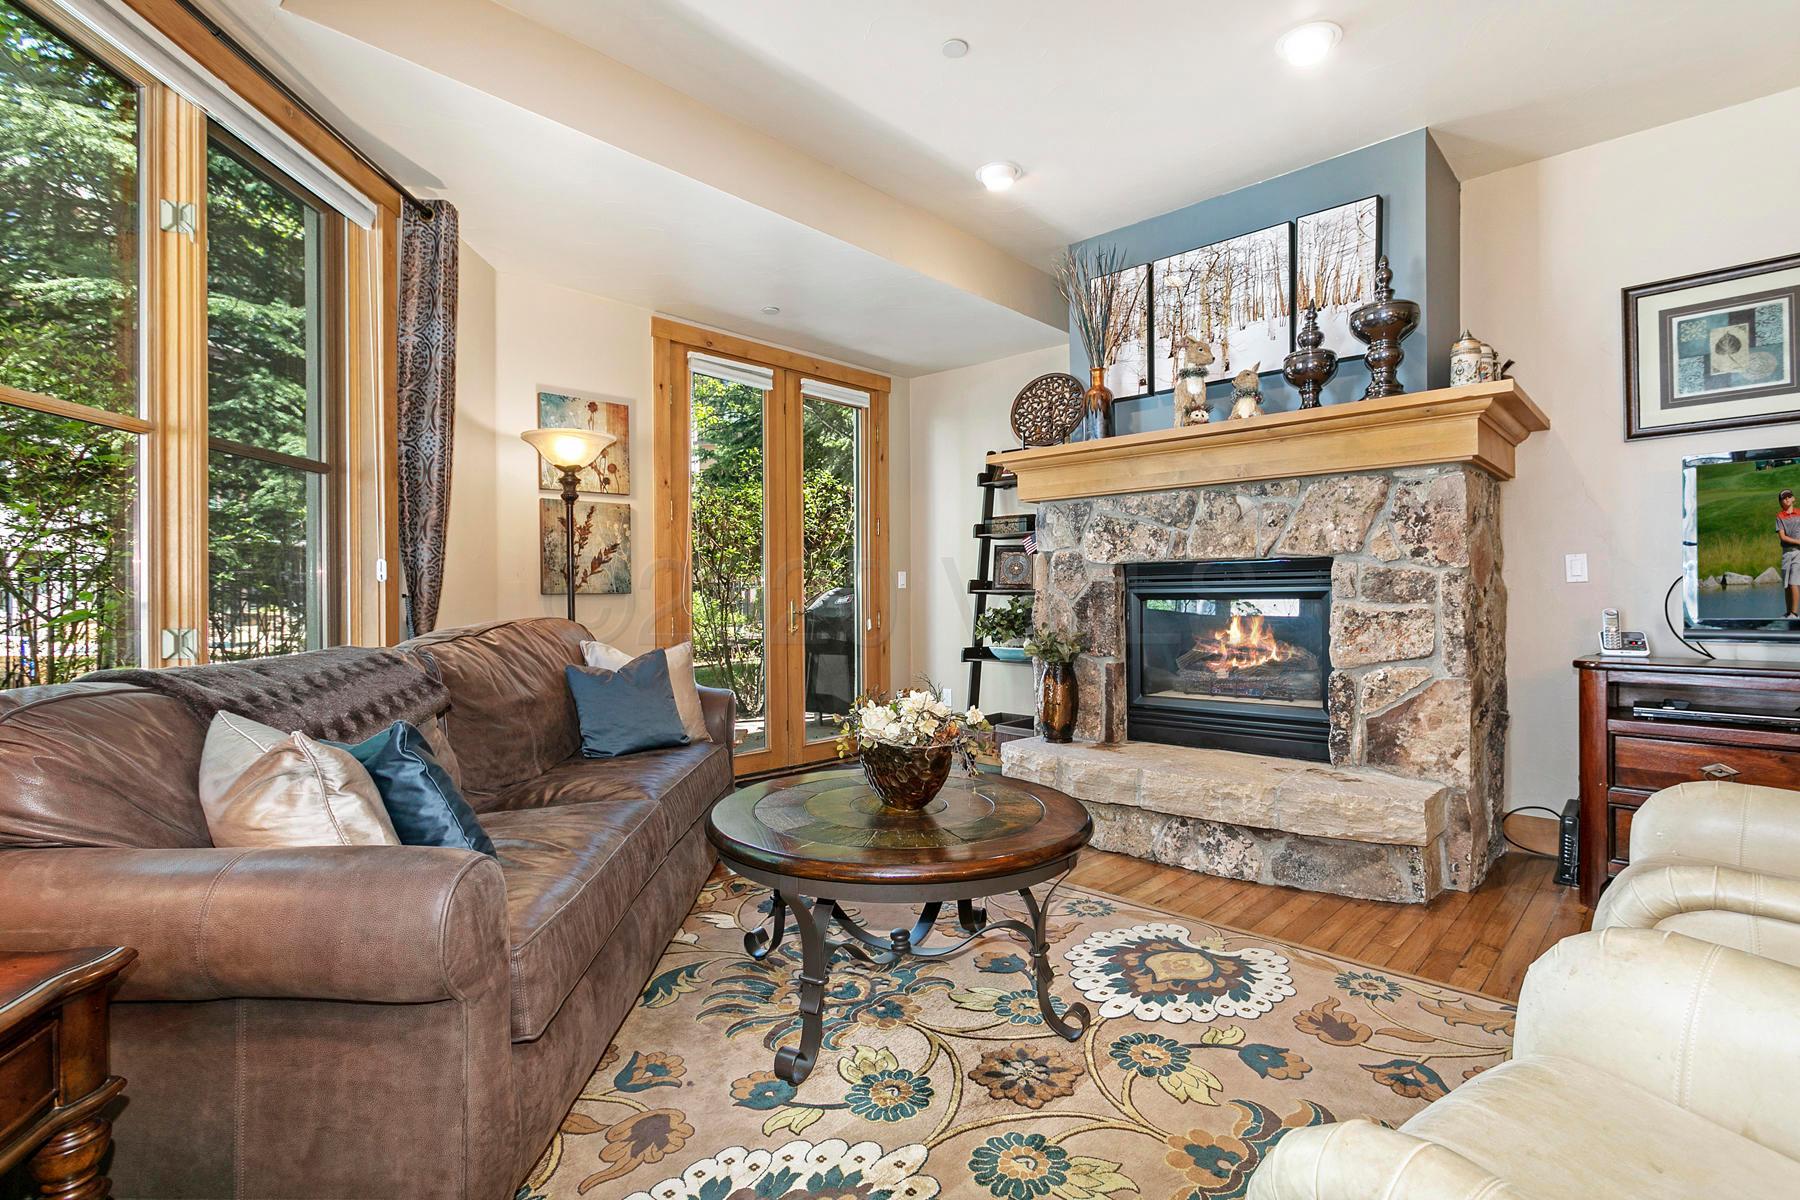 63 Avondale Lane, 118, Beaver Creek, CO 81620 Property Photo - Beaver Creek, CO real estate listing